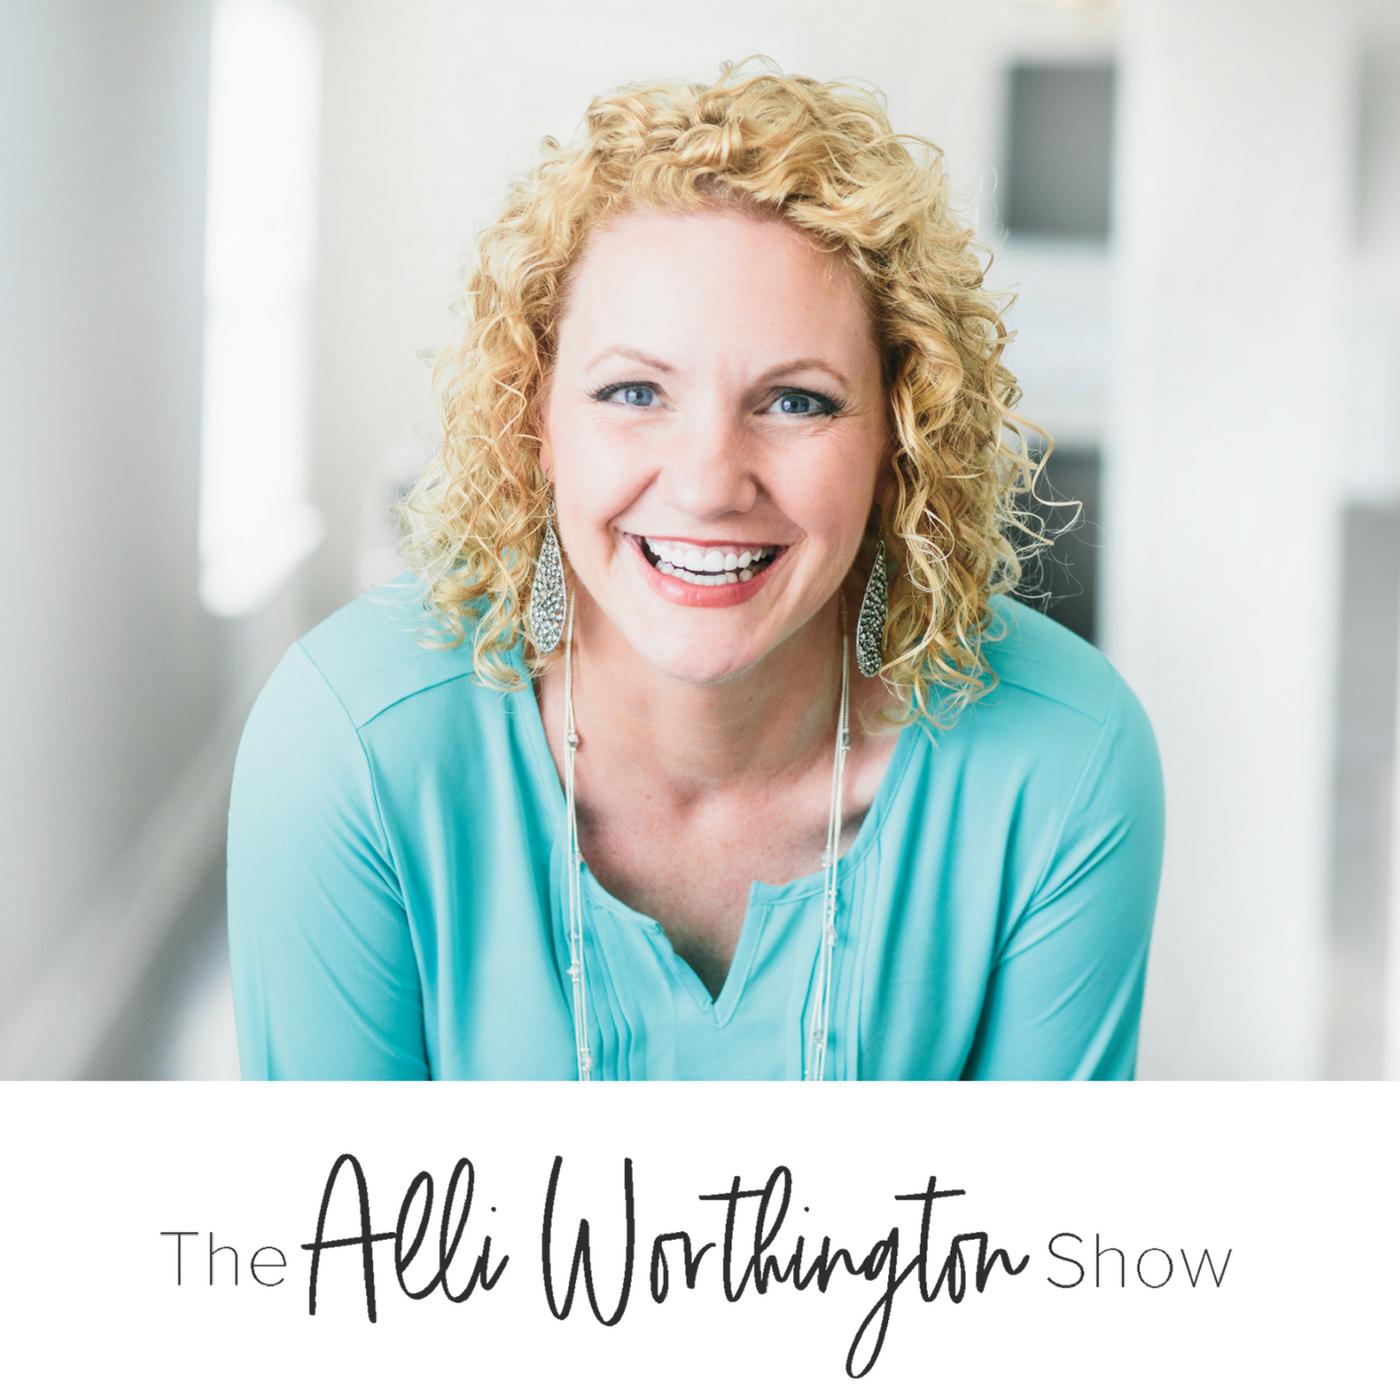 The Alli Worthington Show show art